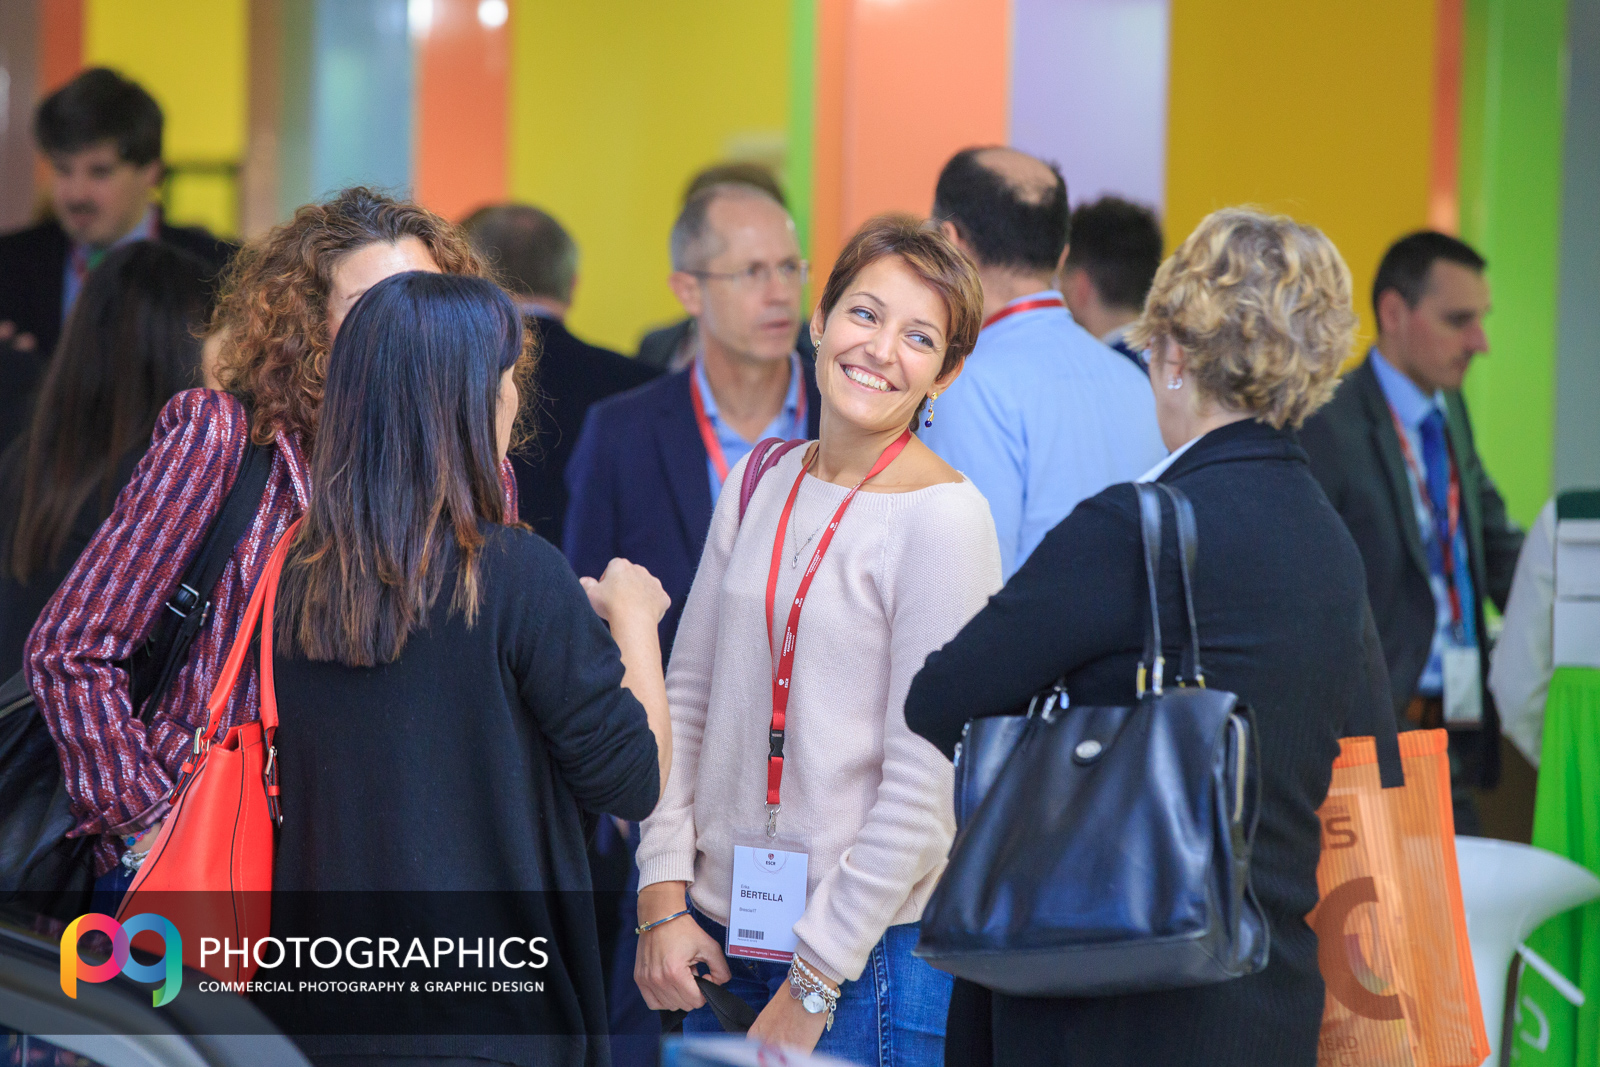 ESCR-2018-conference-event-photography-UK-glasgow-edinburgh-18.jpg